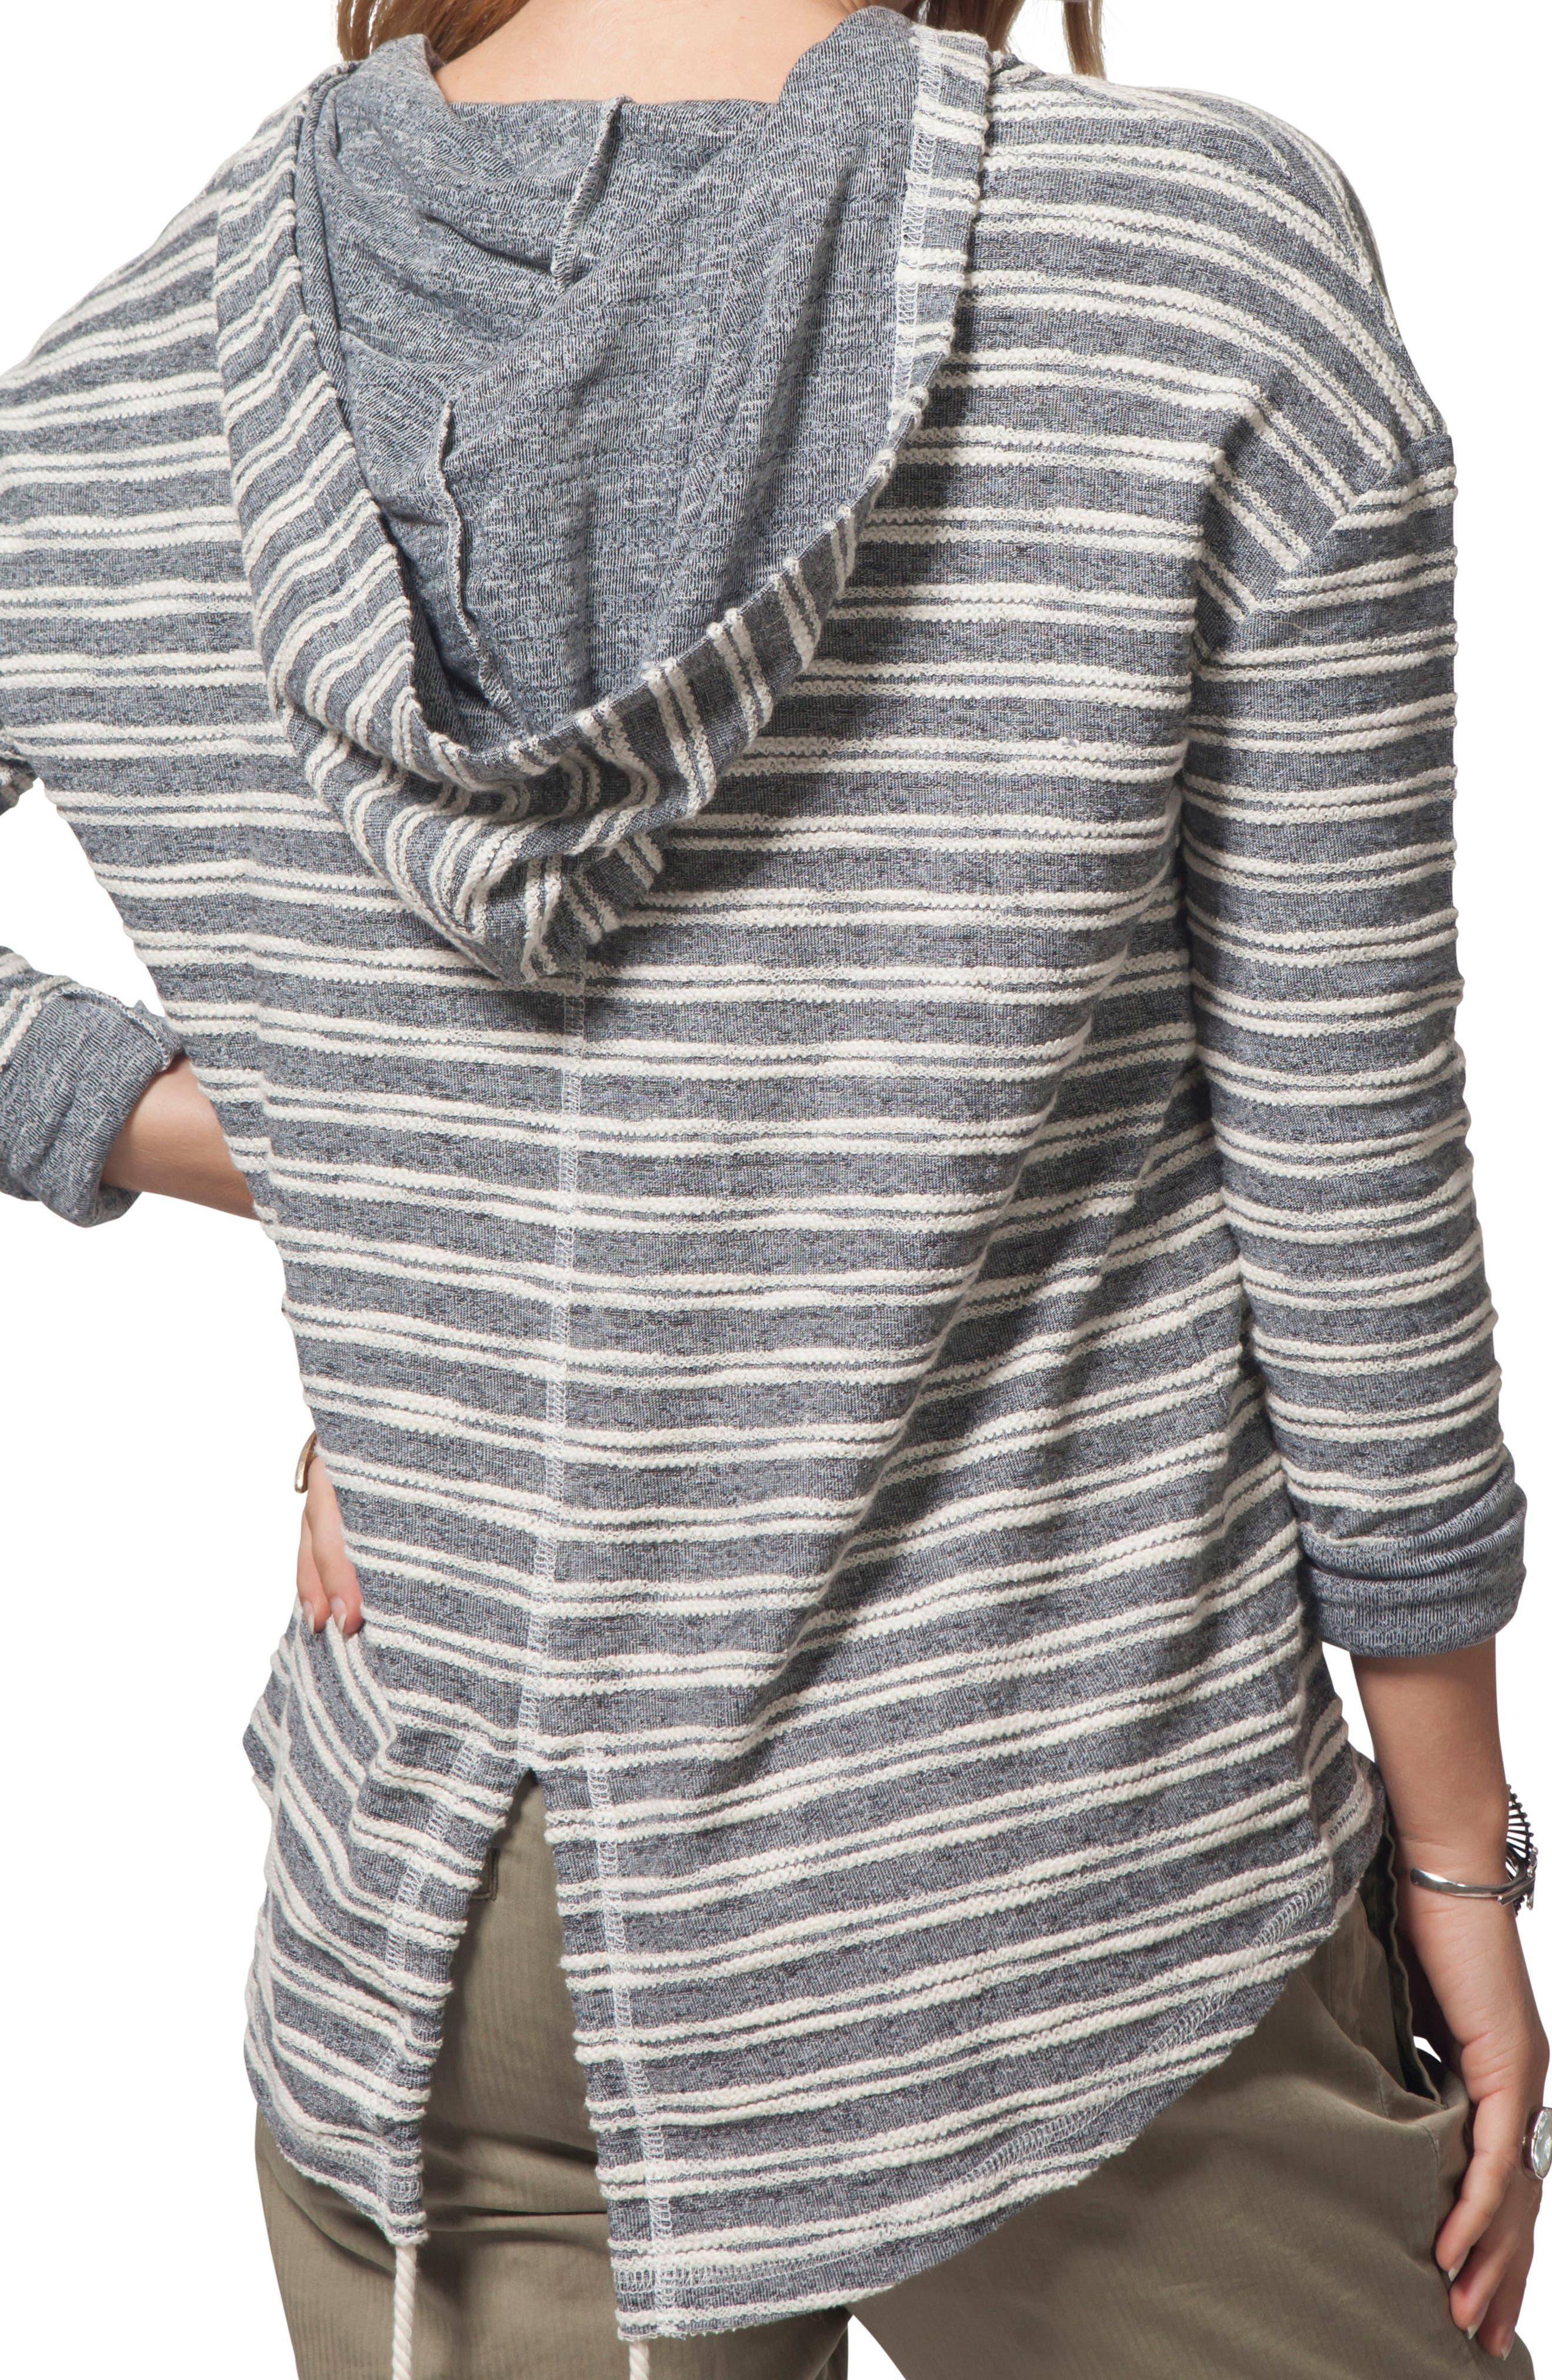 Next Move Stripe Hooded Pullover,                             Alternate thumbnail 3, color,                             BLACK